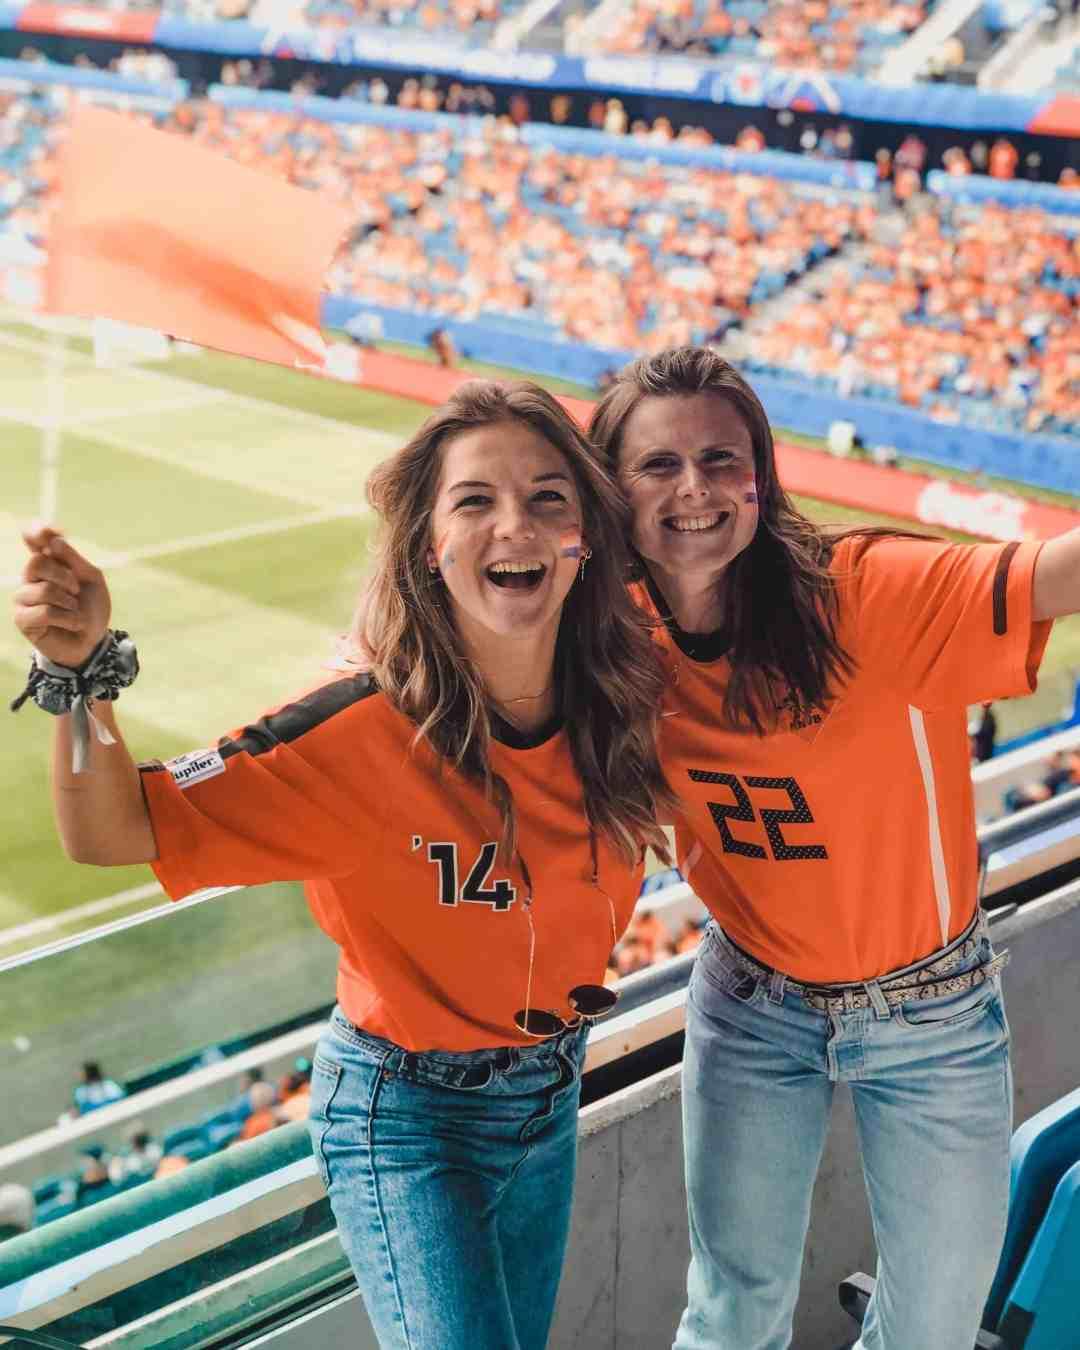 wk vrouwen voetbal